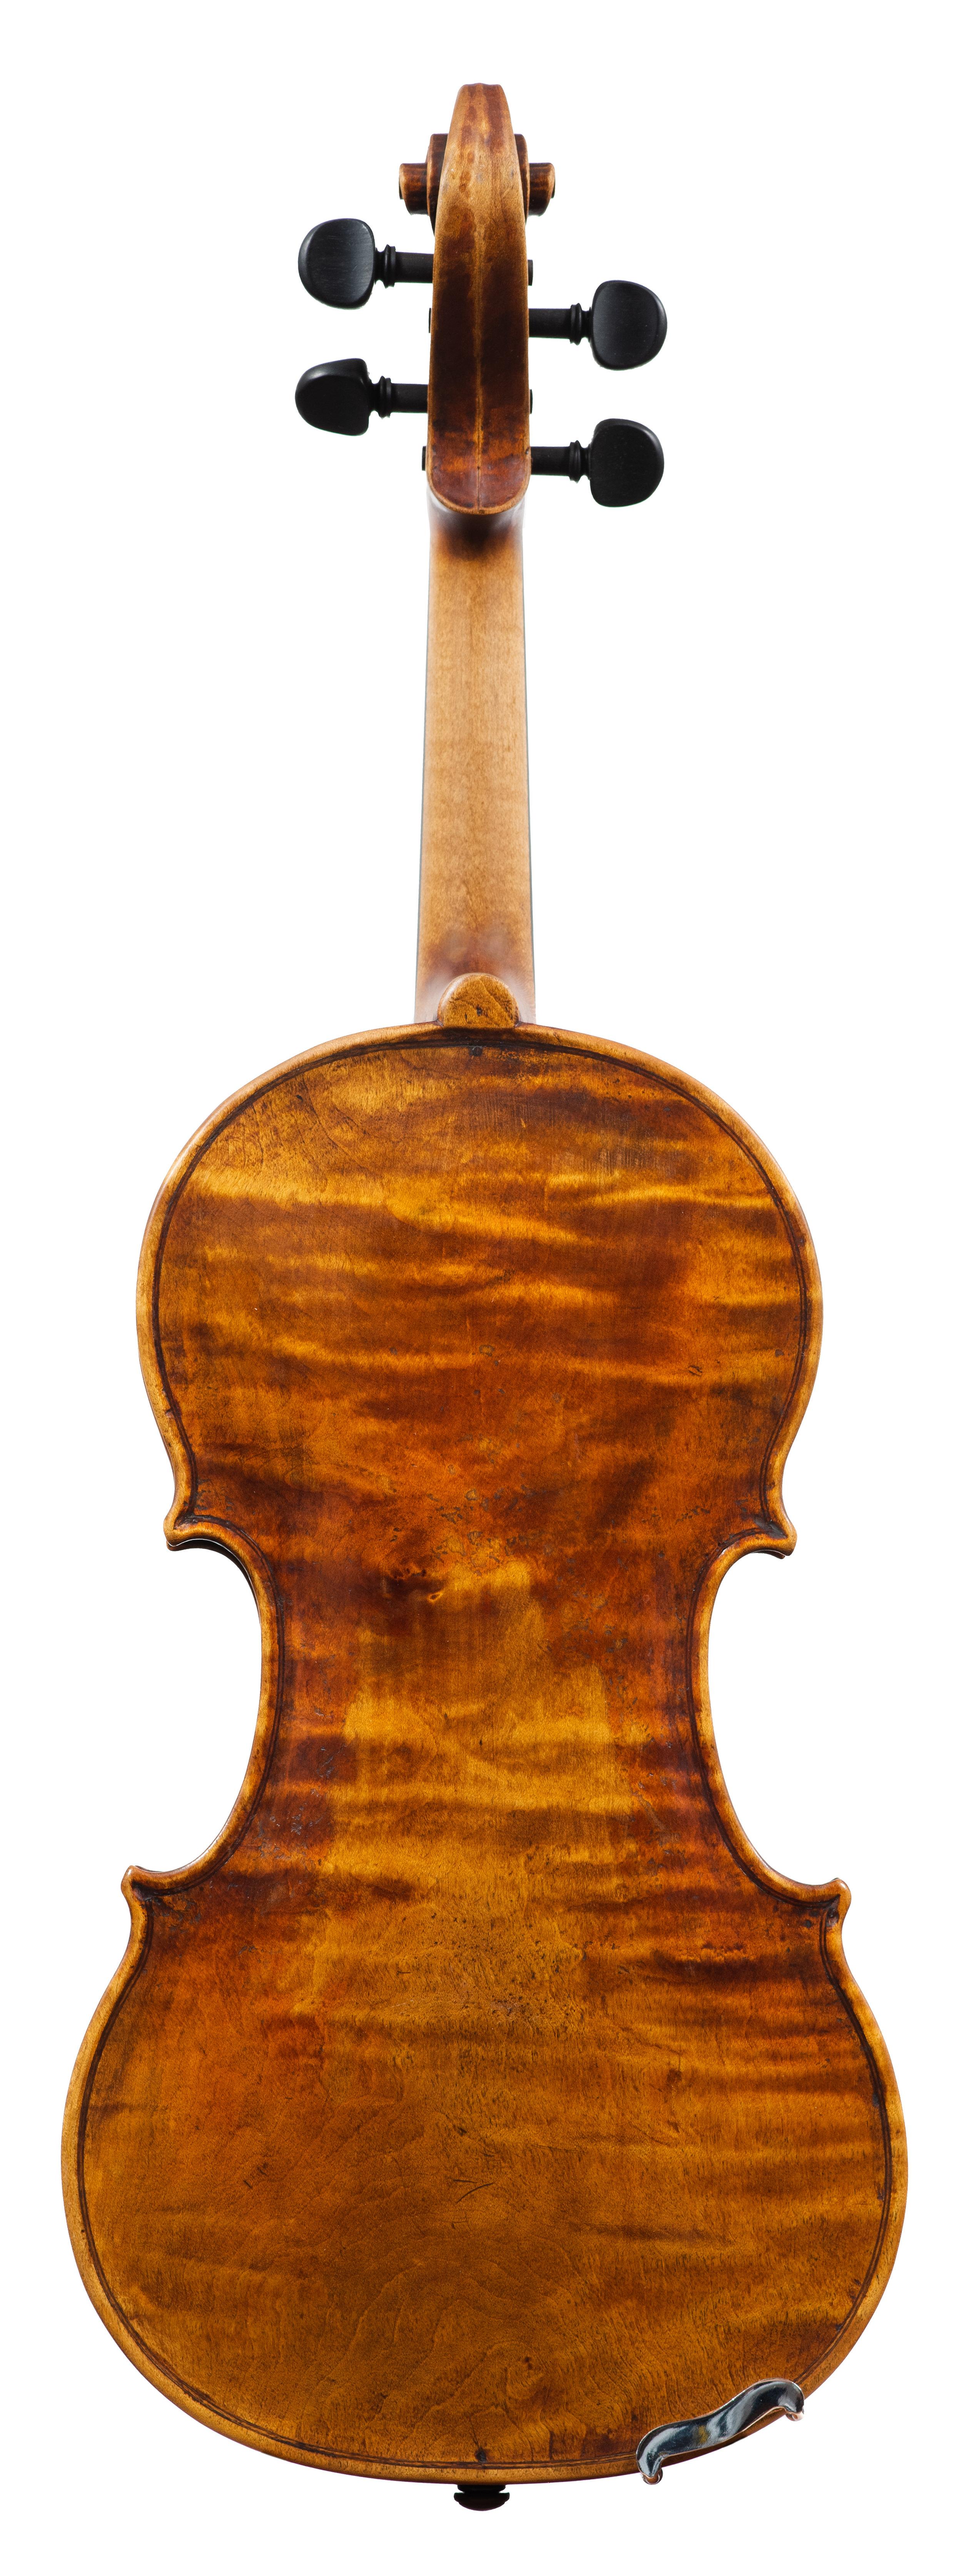 Jordan Hess Violin, 2018, Salt Lake City, UT_Back.jpg